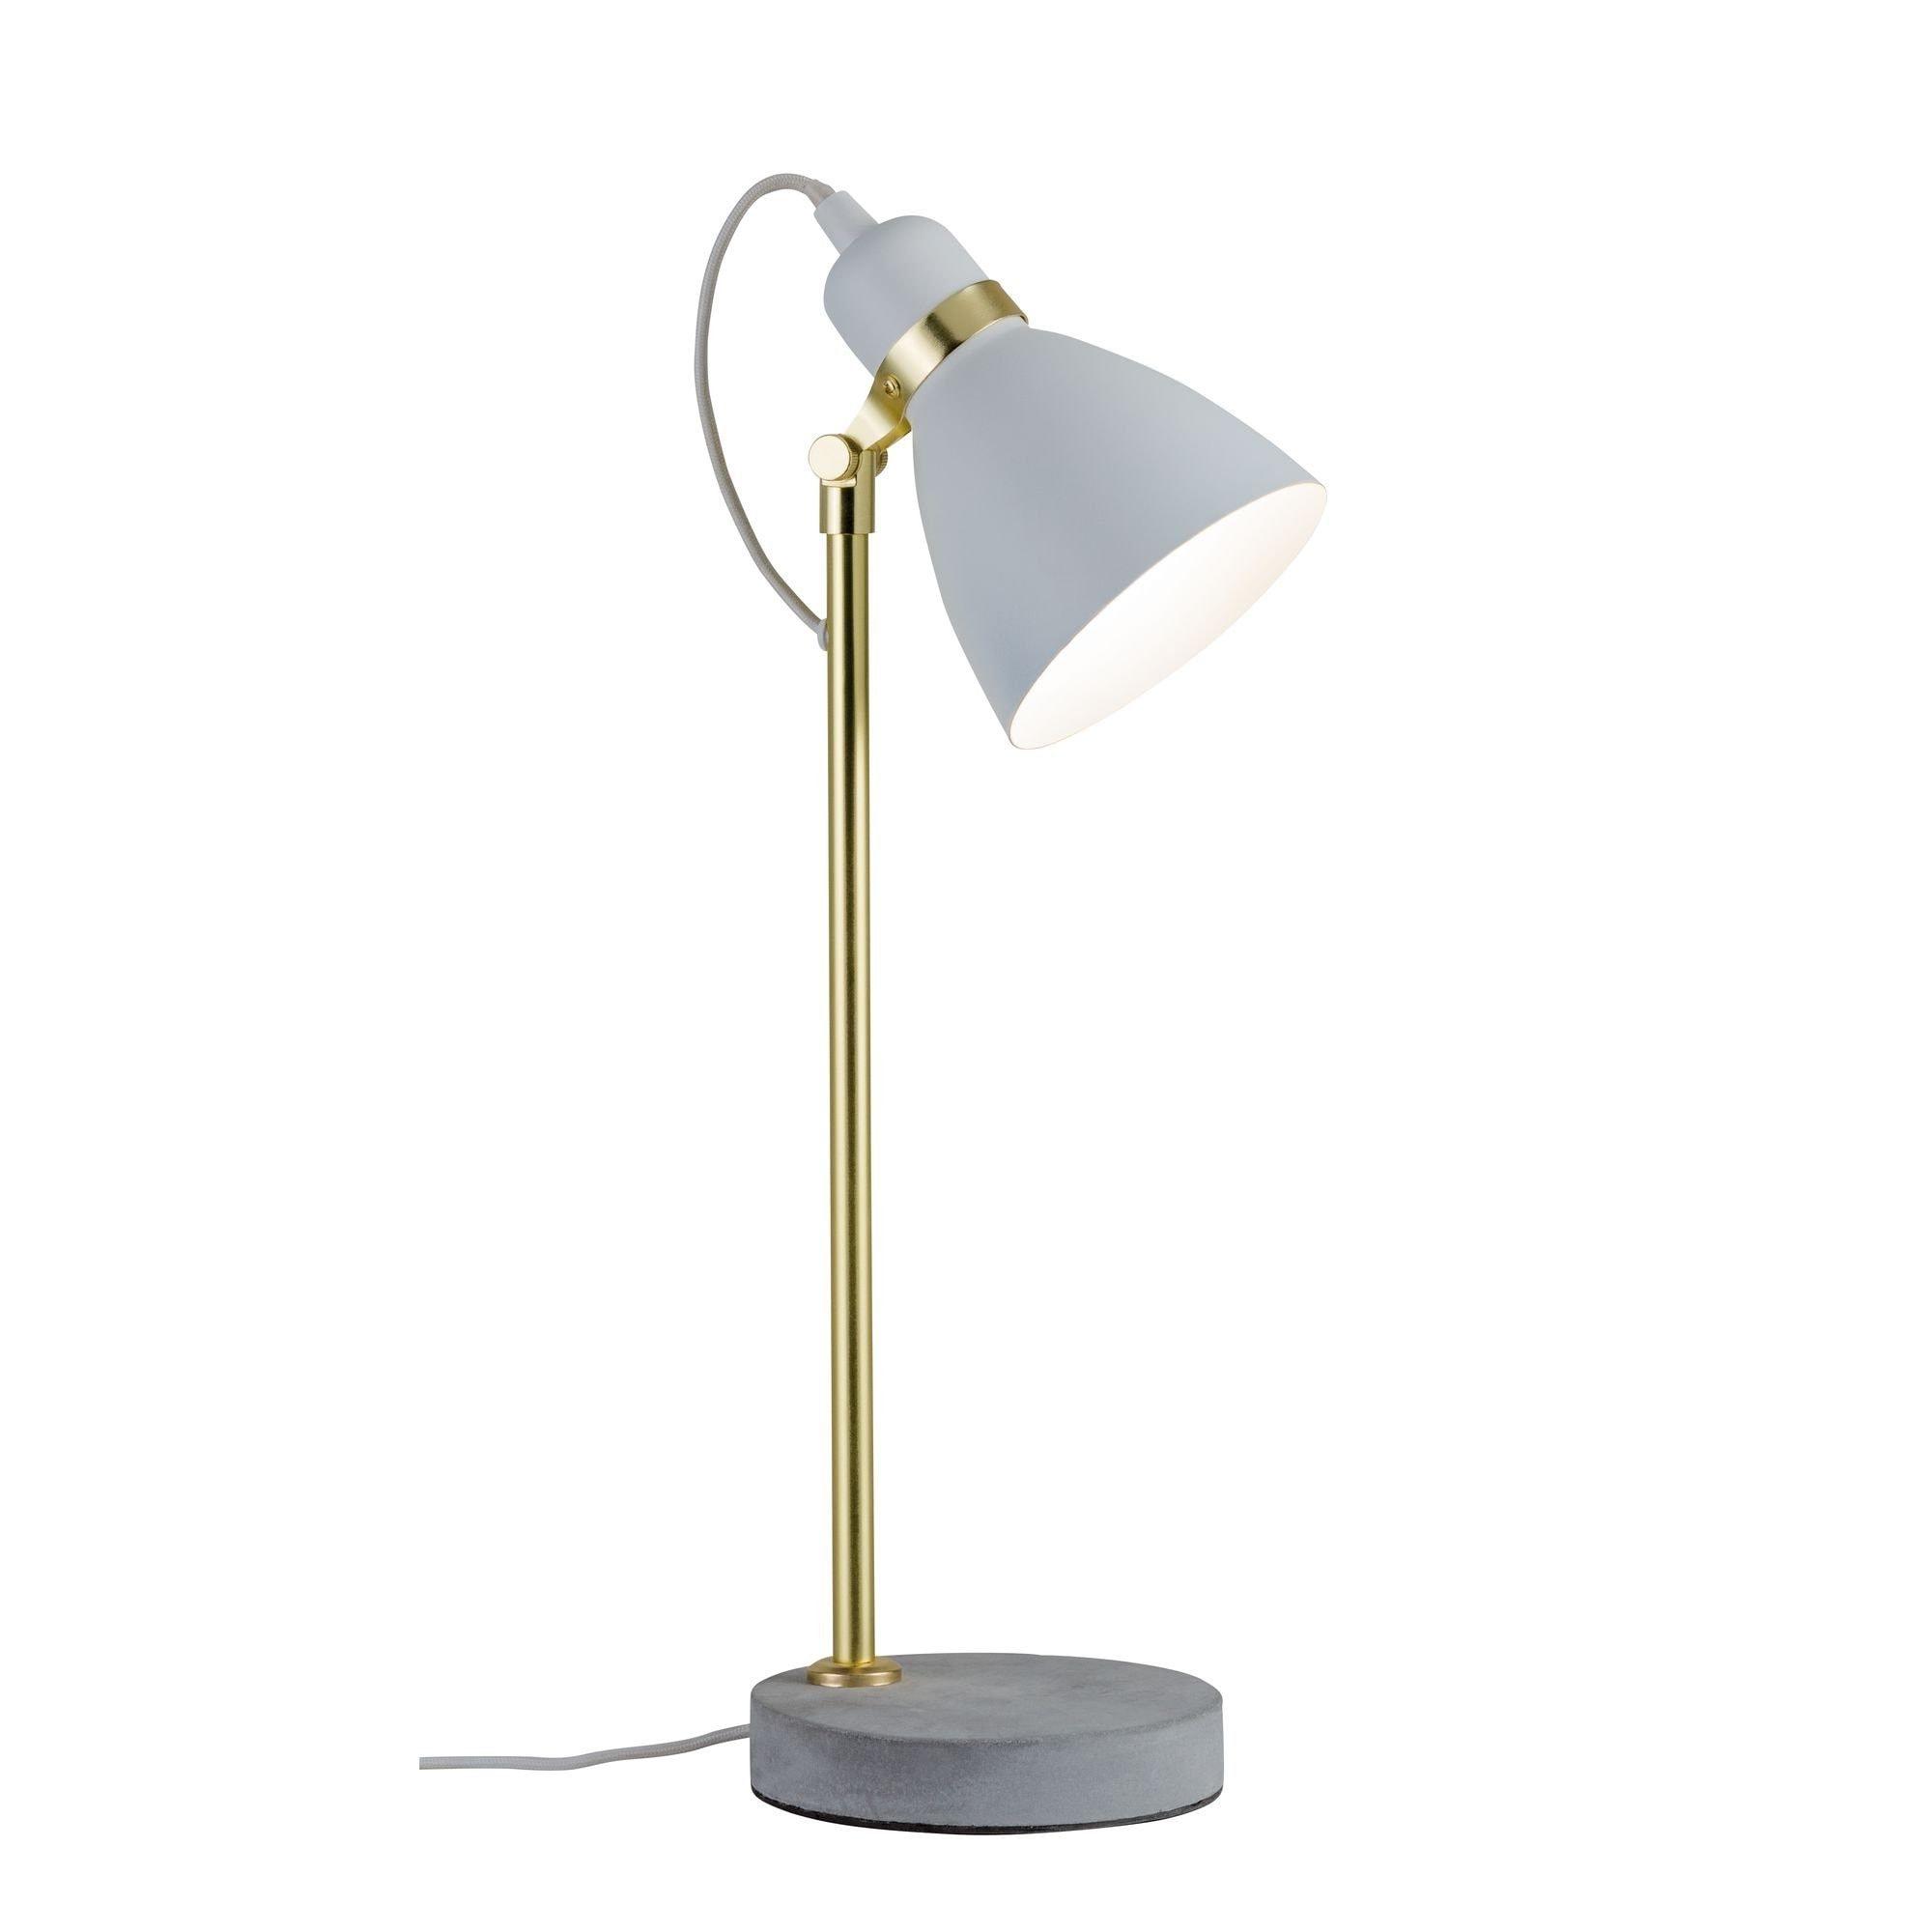 Paulmann LED Tischleuchte Neordic Orm Beton/Weiß/Gold, E27, 1 St.